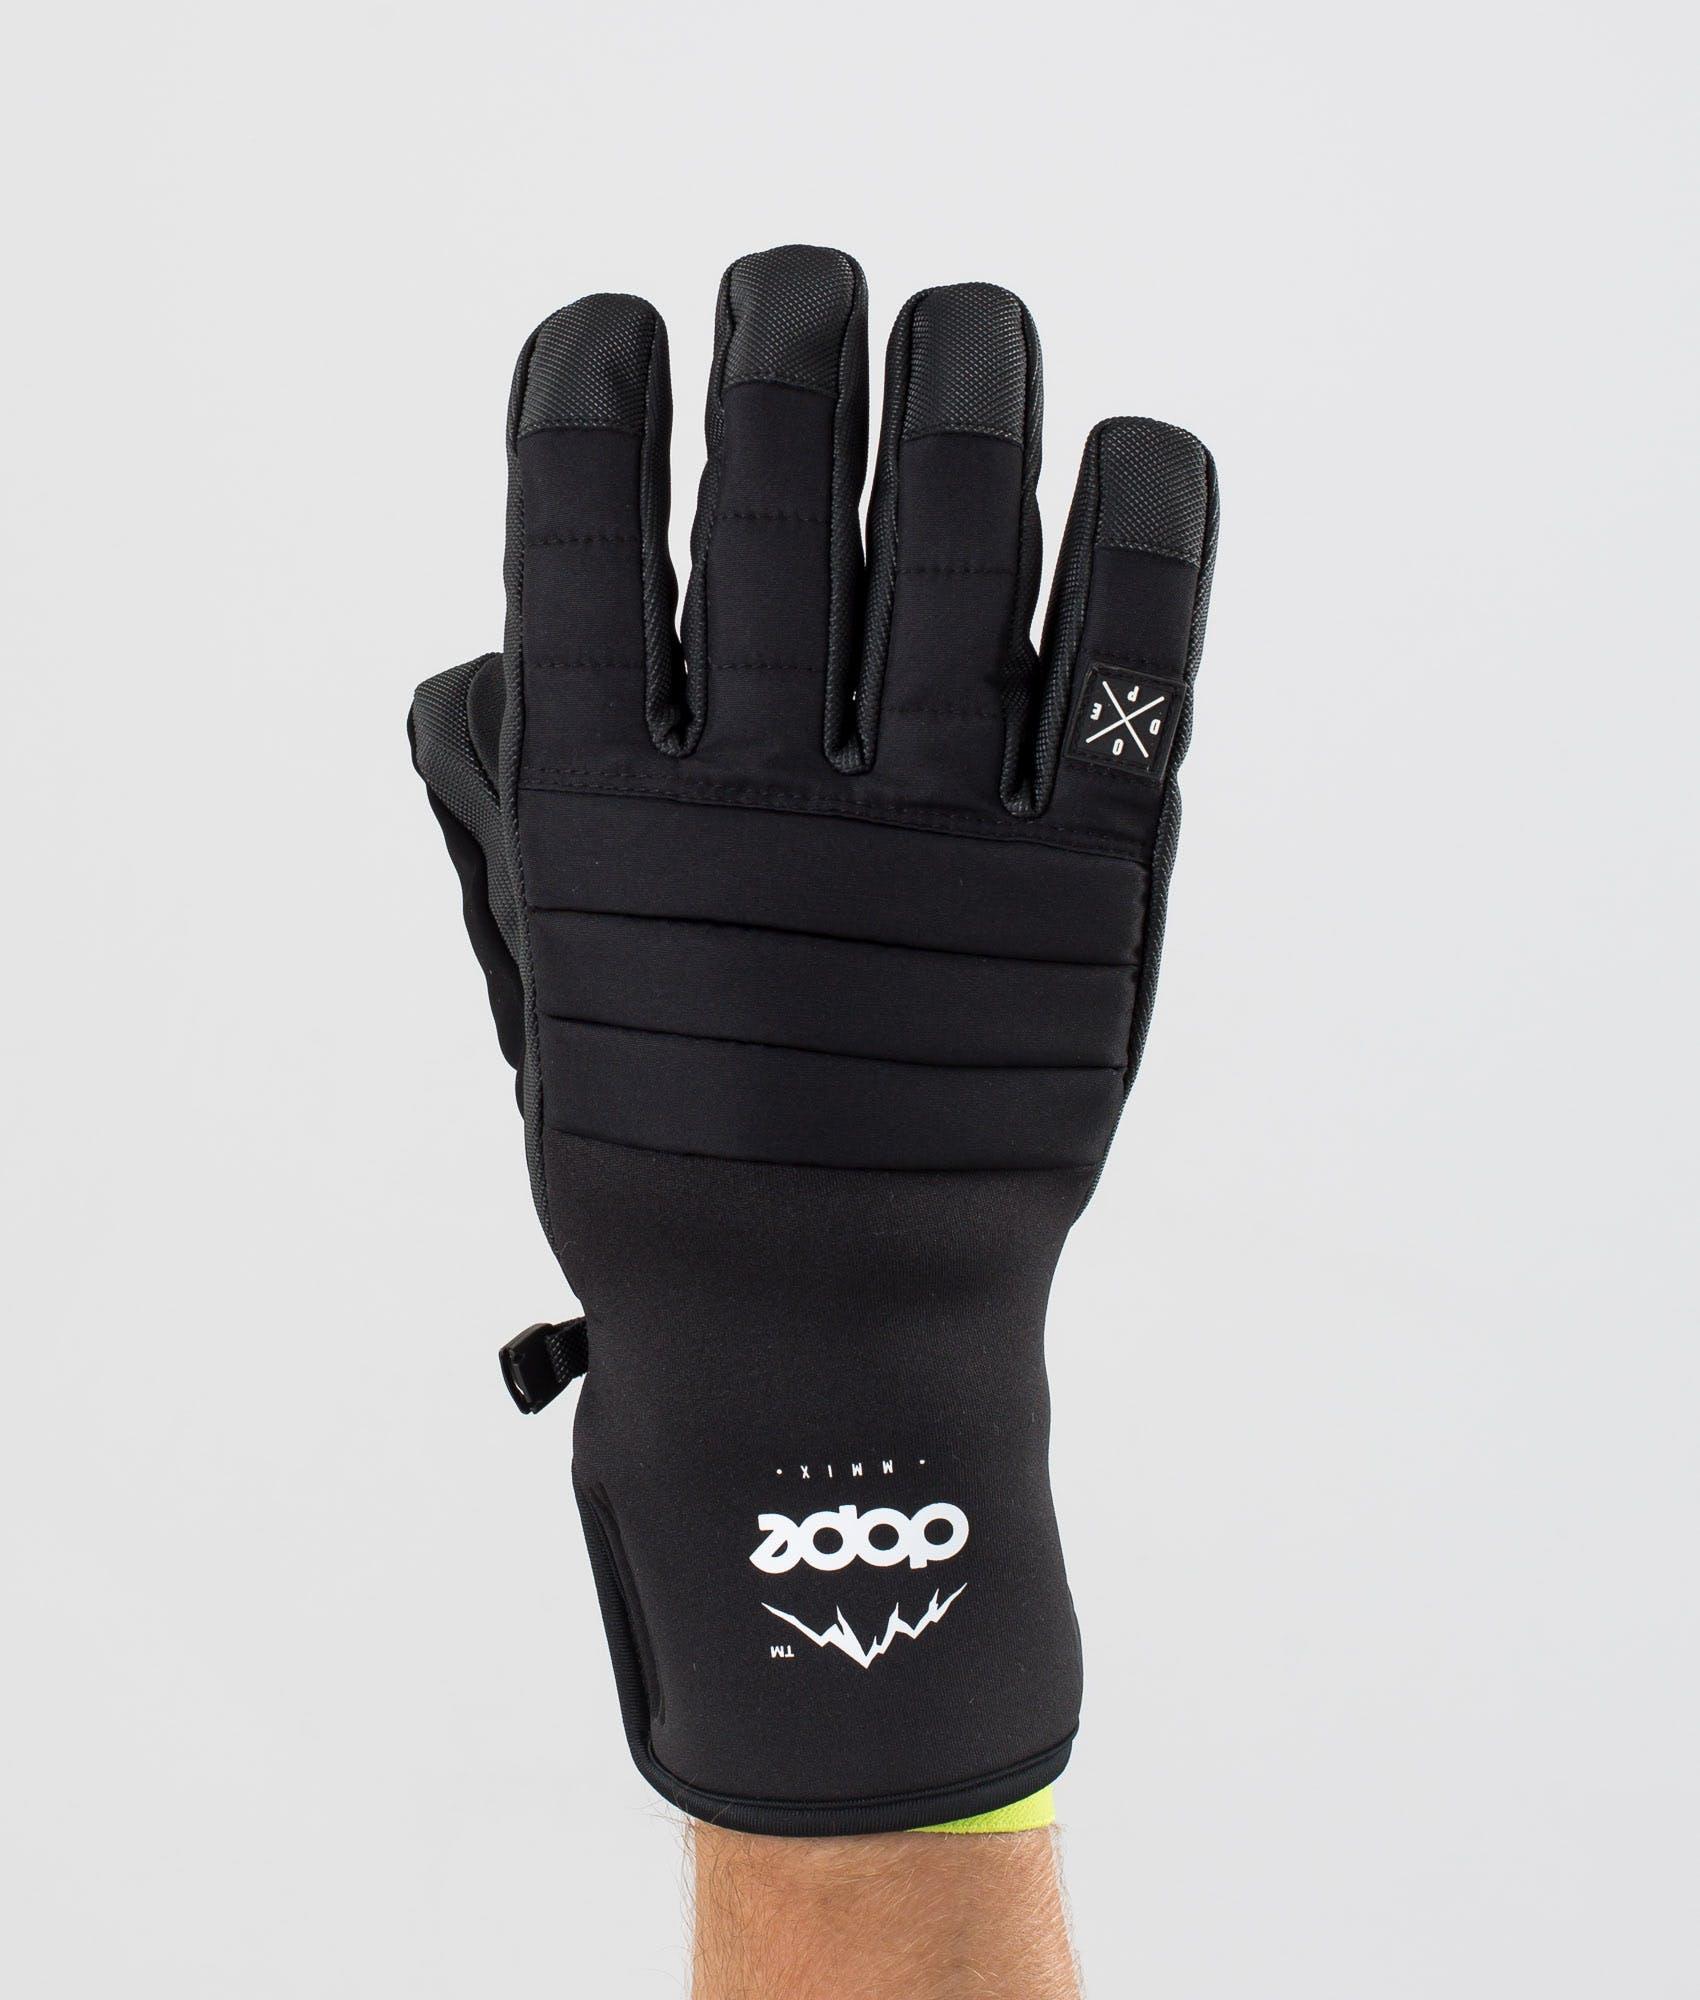 Dope Ace Glove Black